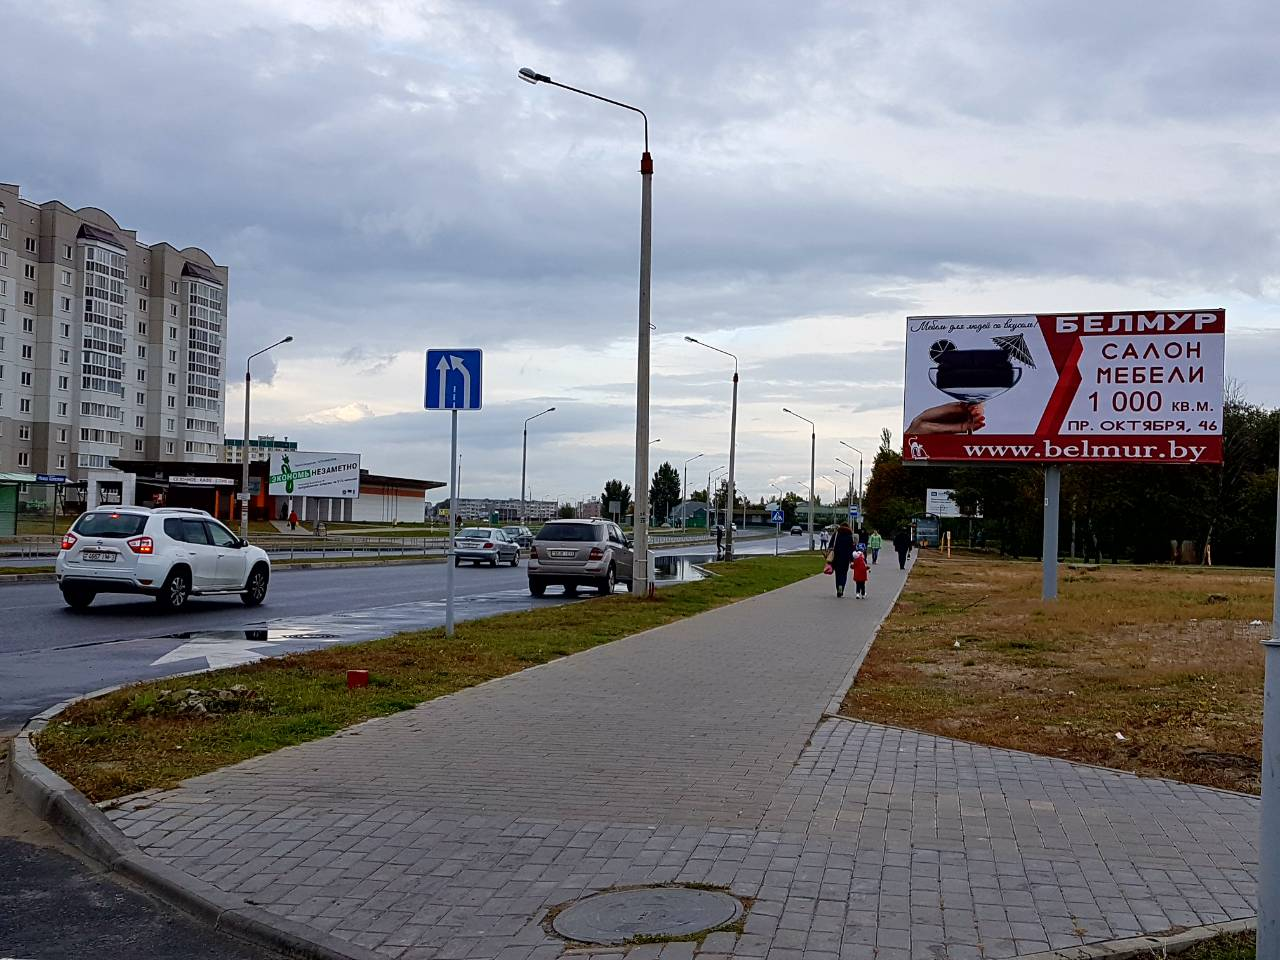 Билборд по ул. Белого, 19 (сторона А)